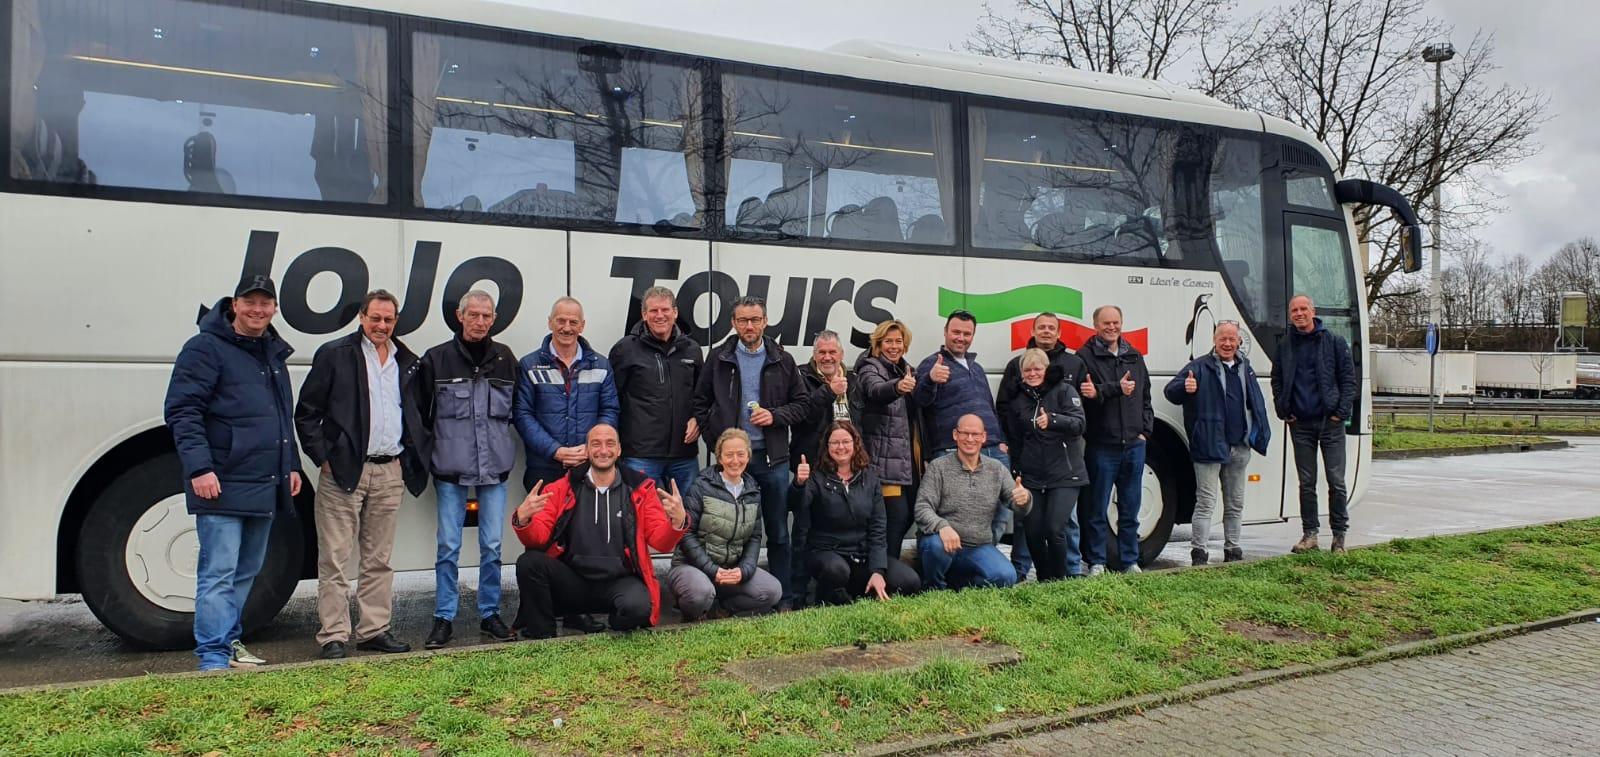 jojo tours vervoersproject team